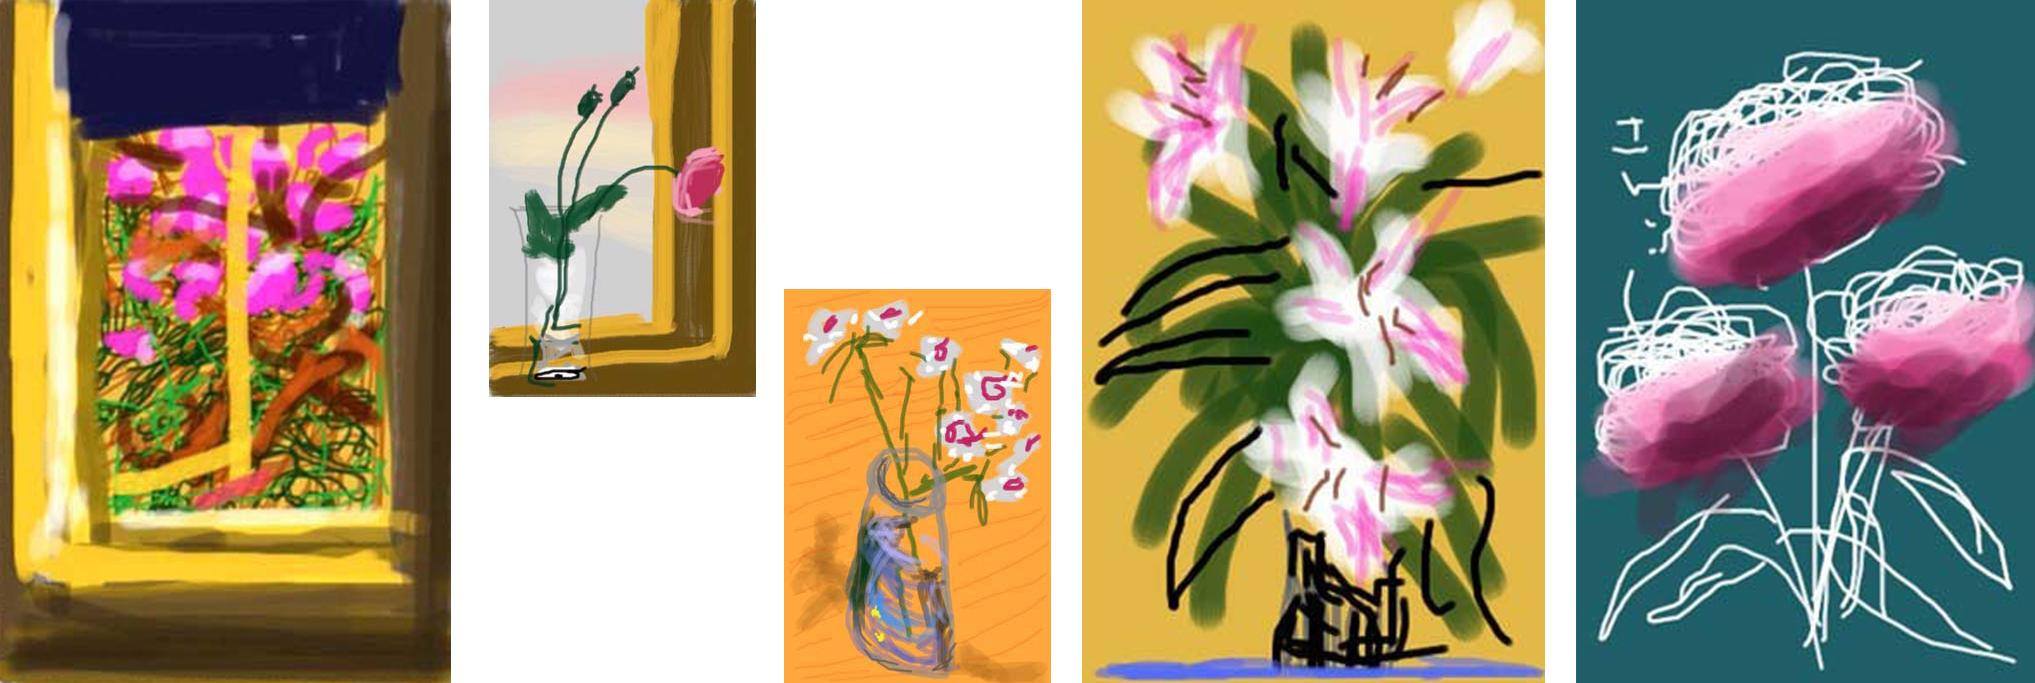 fiori-di-hockney